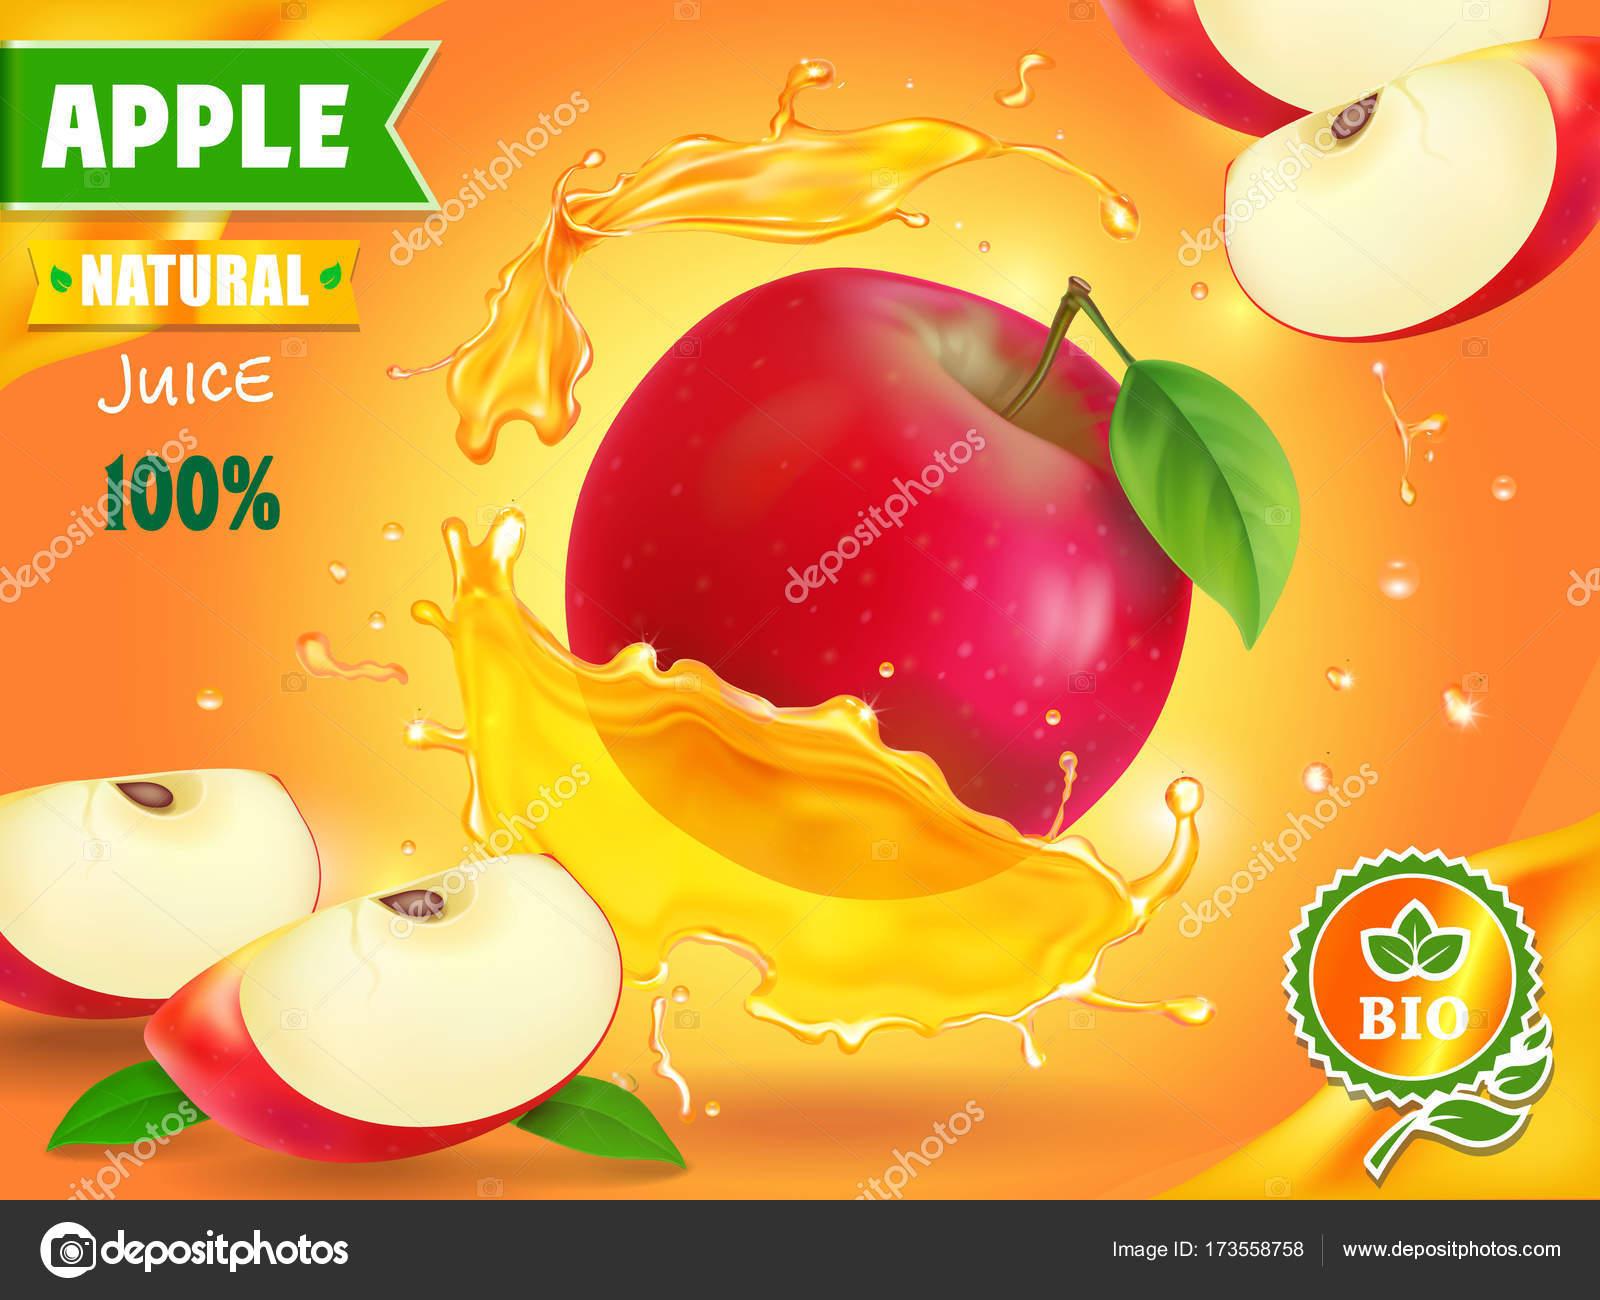 apple juice advertising fruit refreshing drink ad stock vector